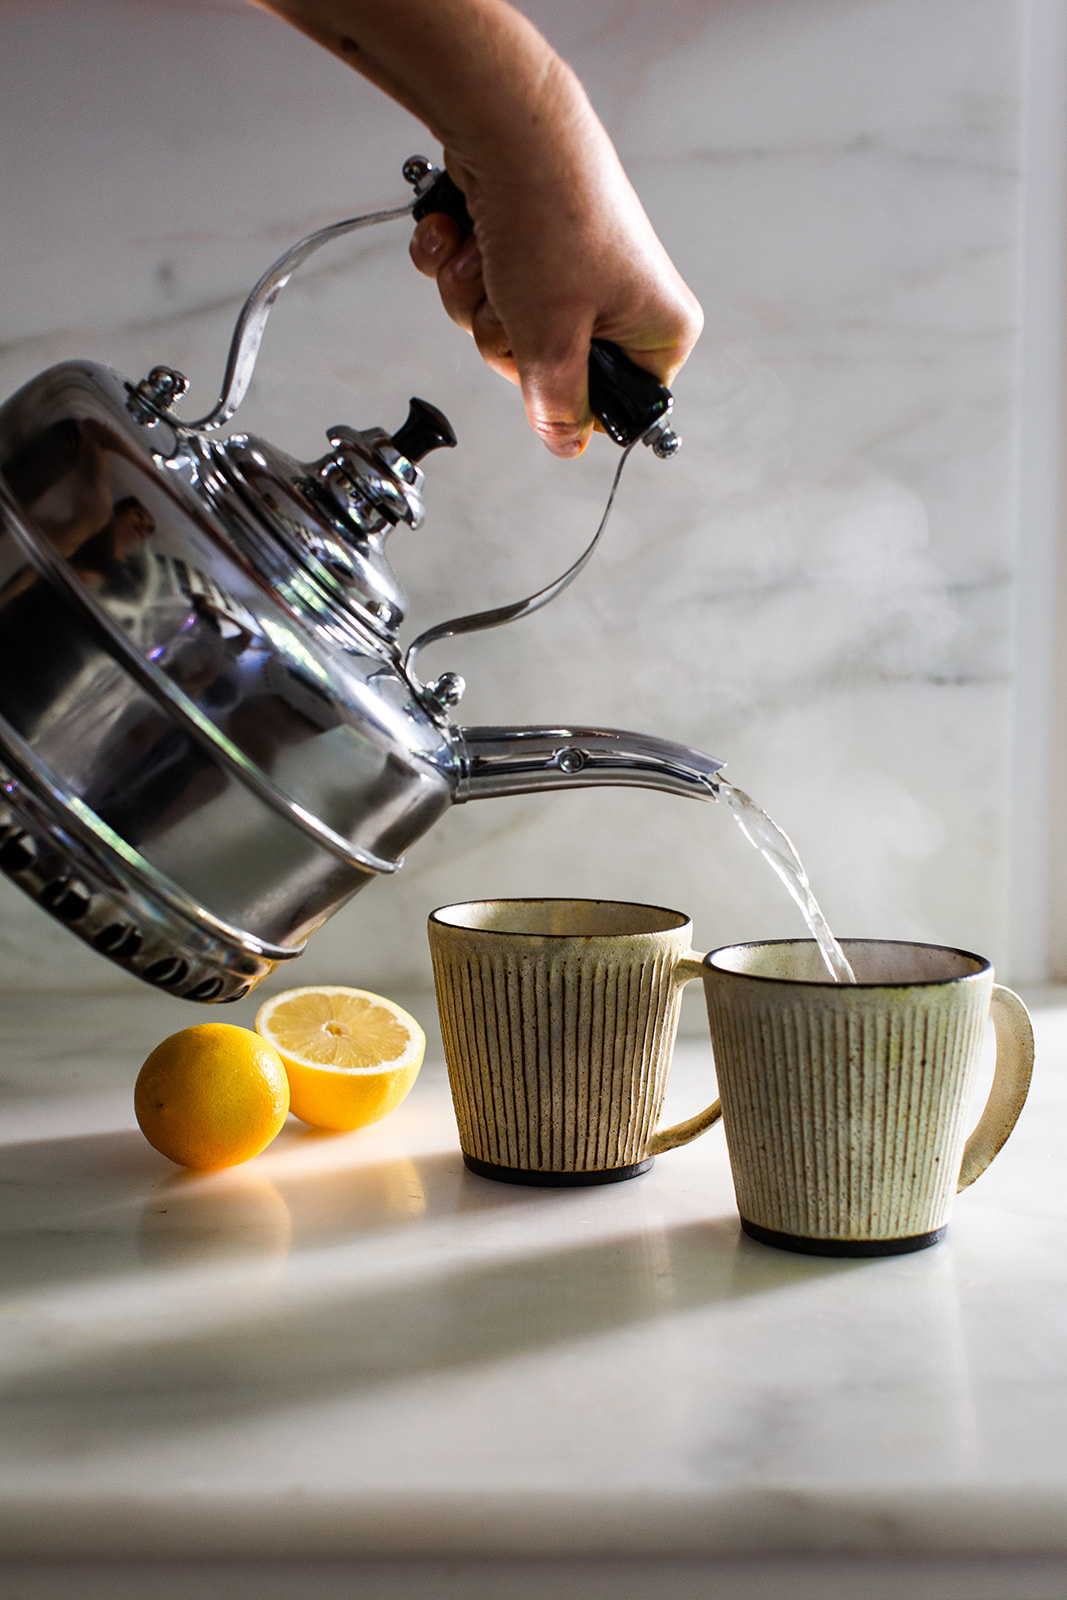 pouring tea into teacups